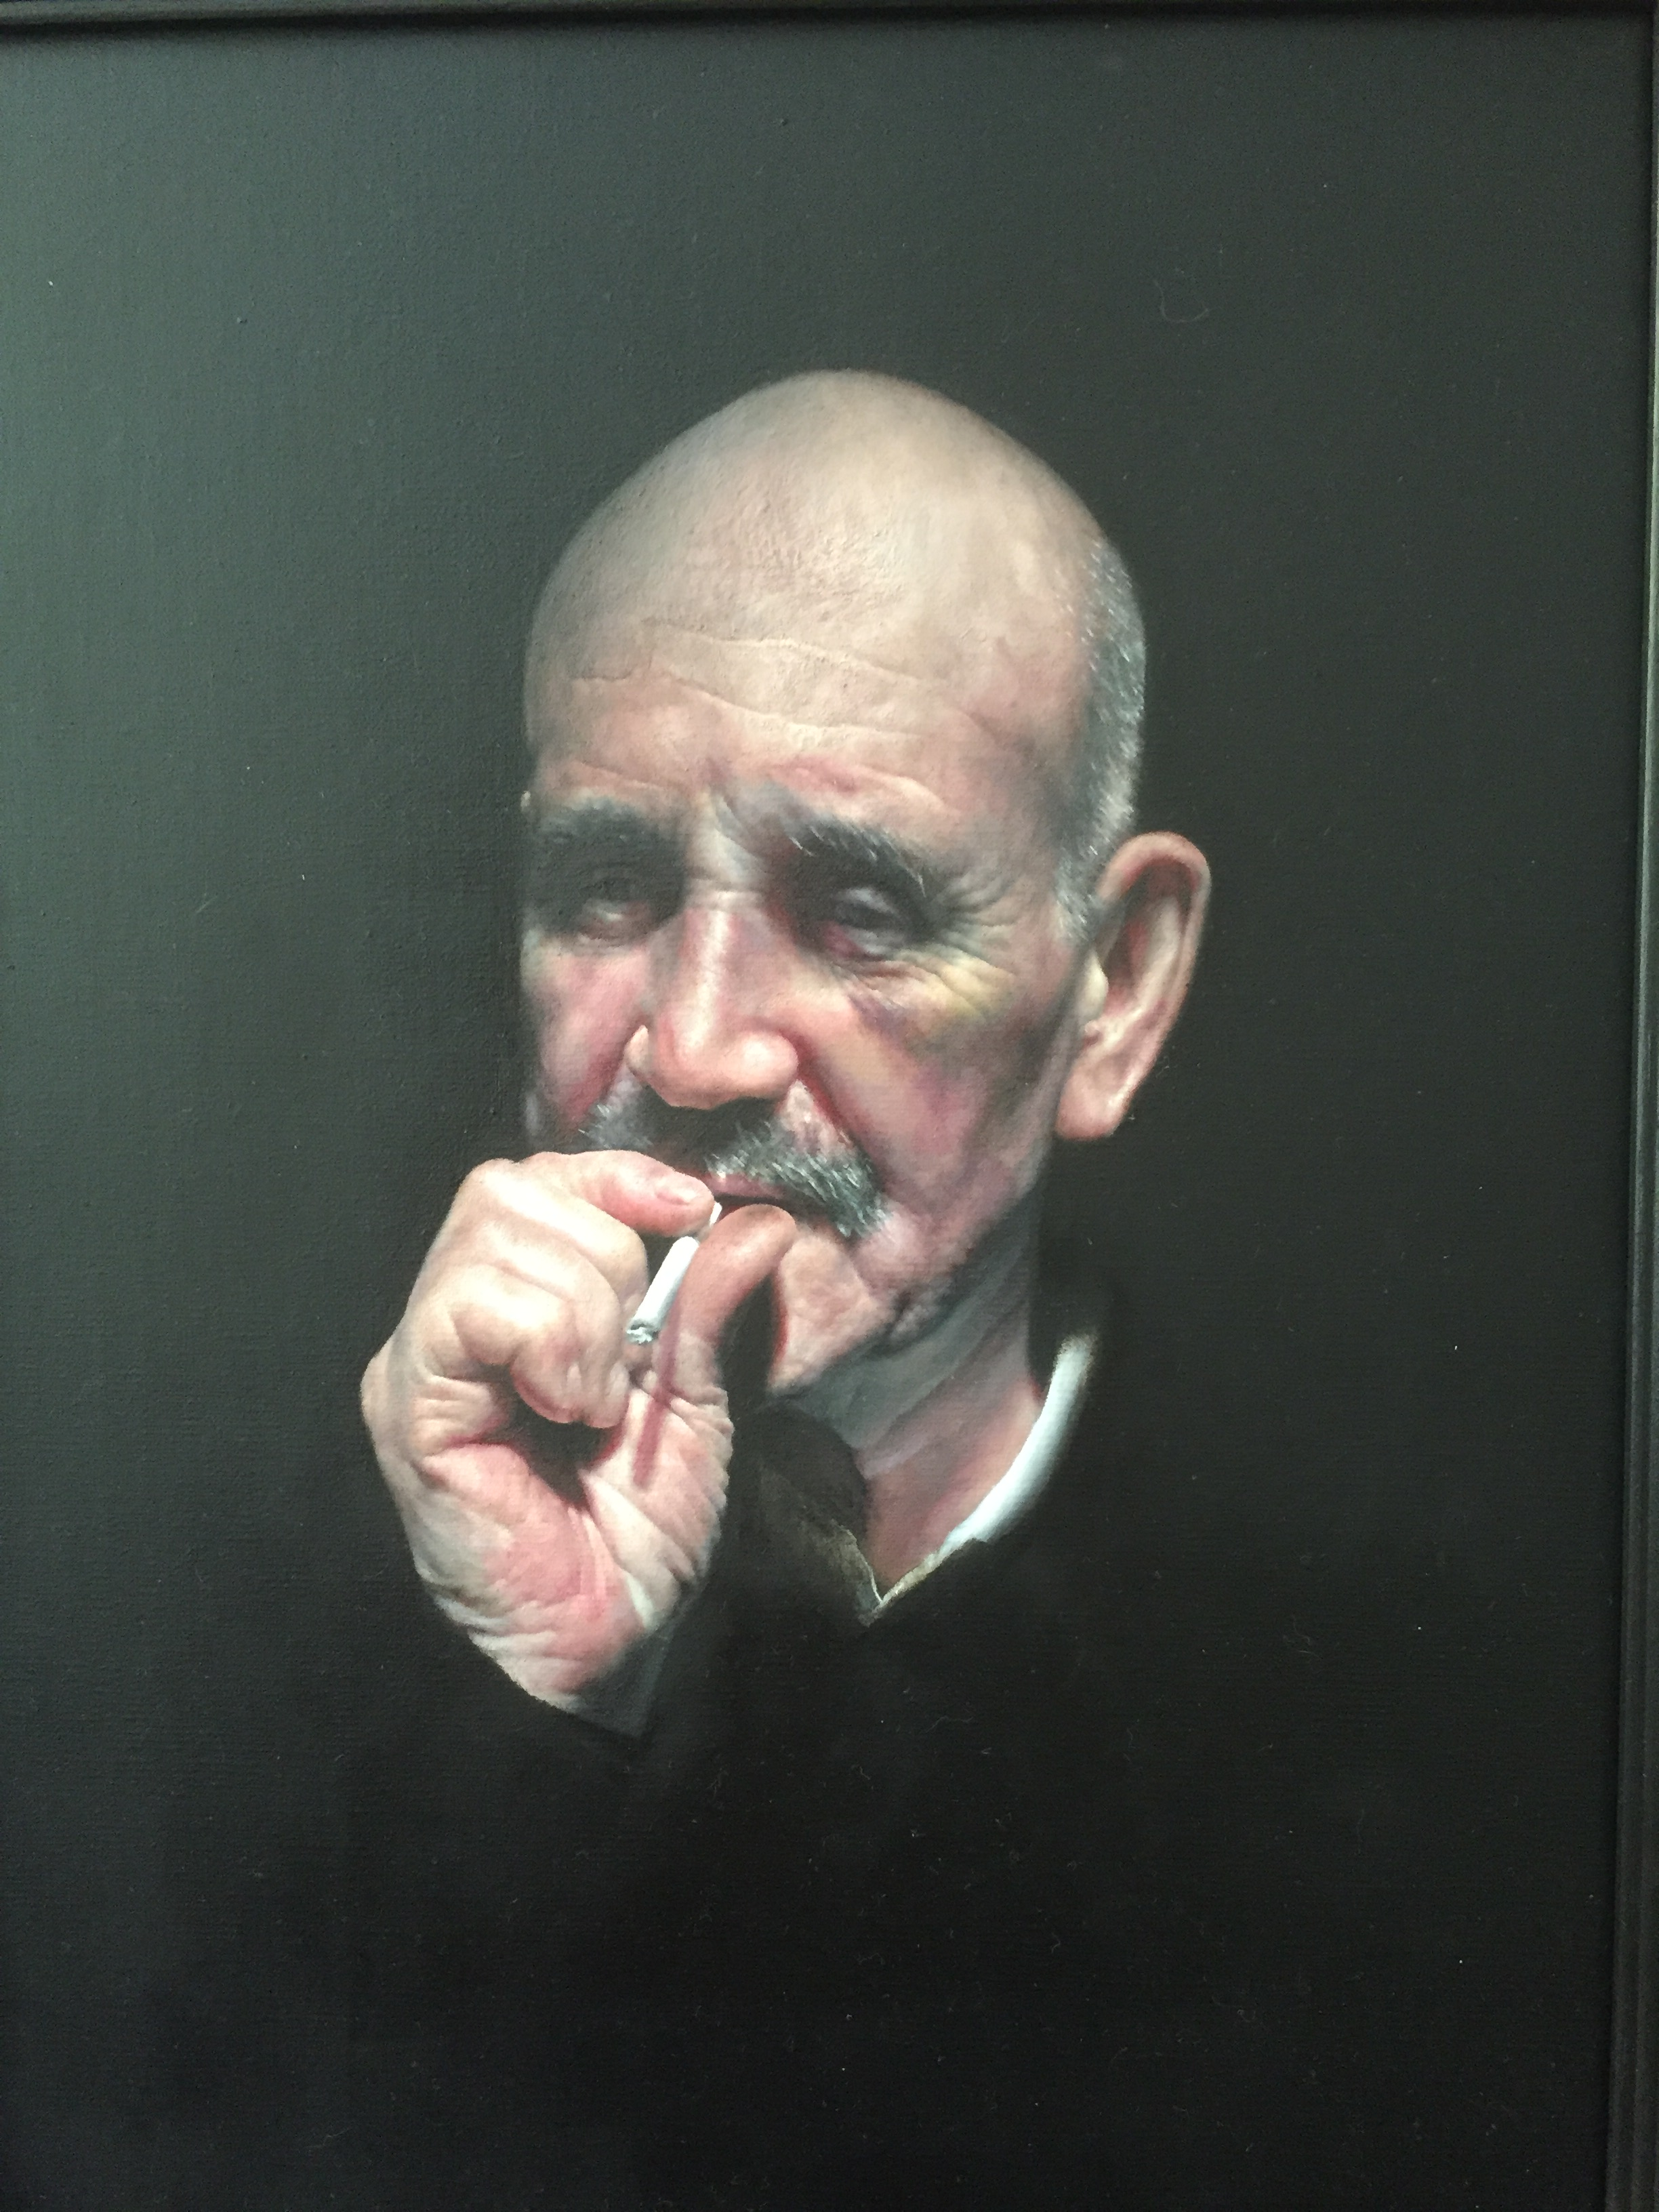 SPA 2017 Exhibition,James, 48 x 54 cm,Oil on canvas,£5,000